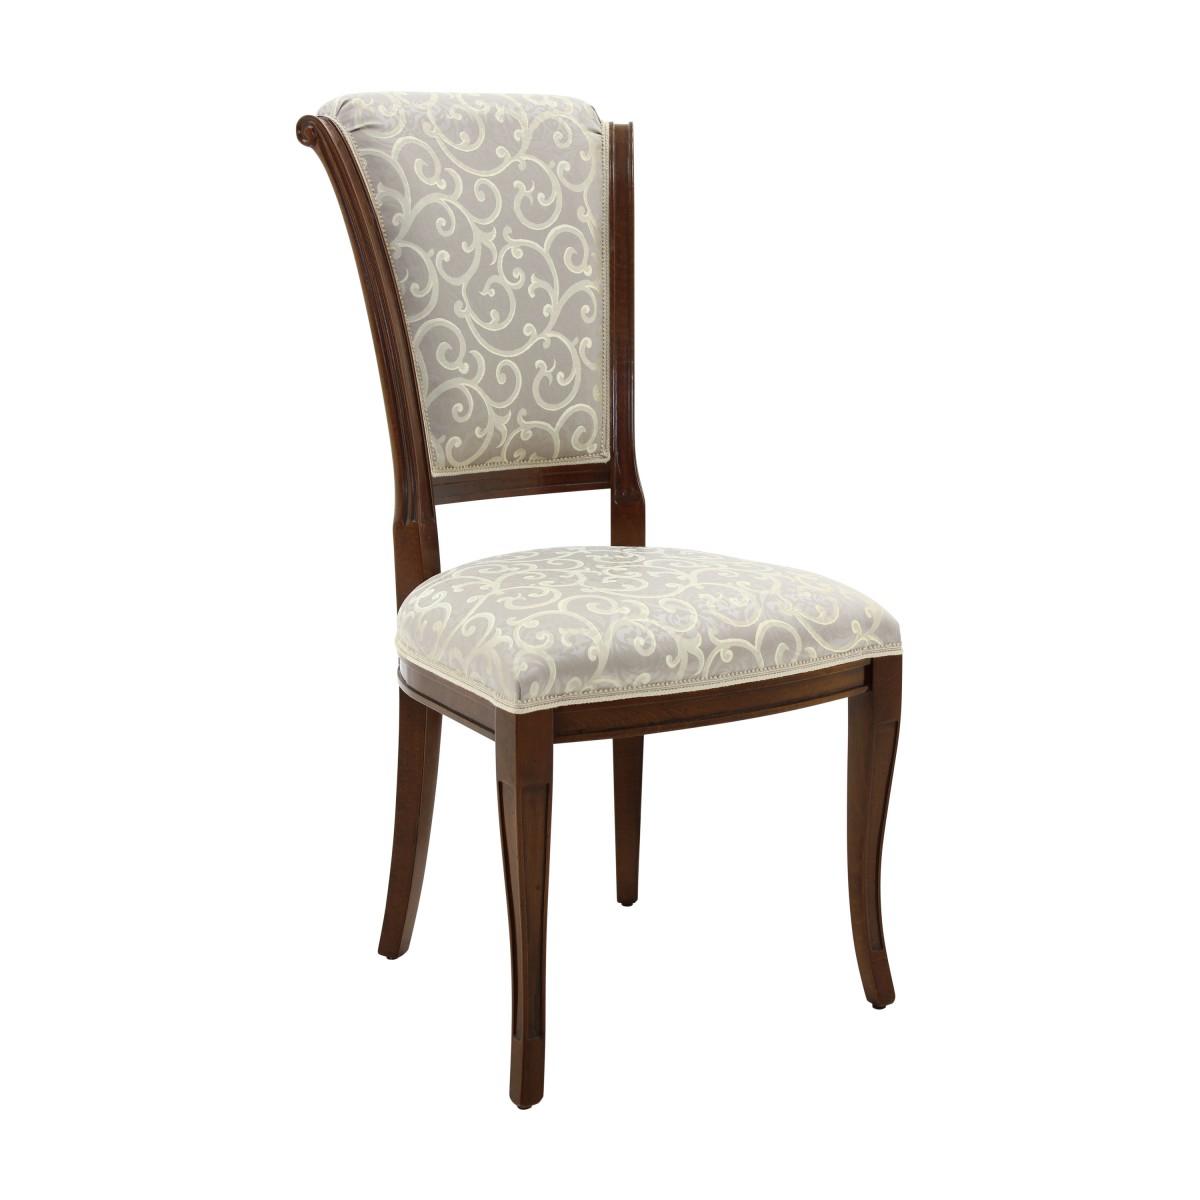 italian classic chair verona 2 5396